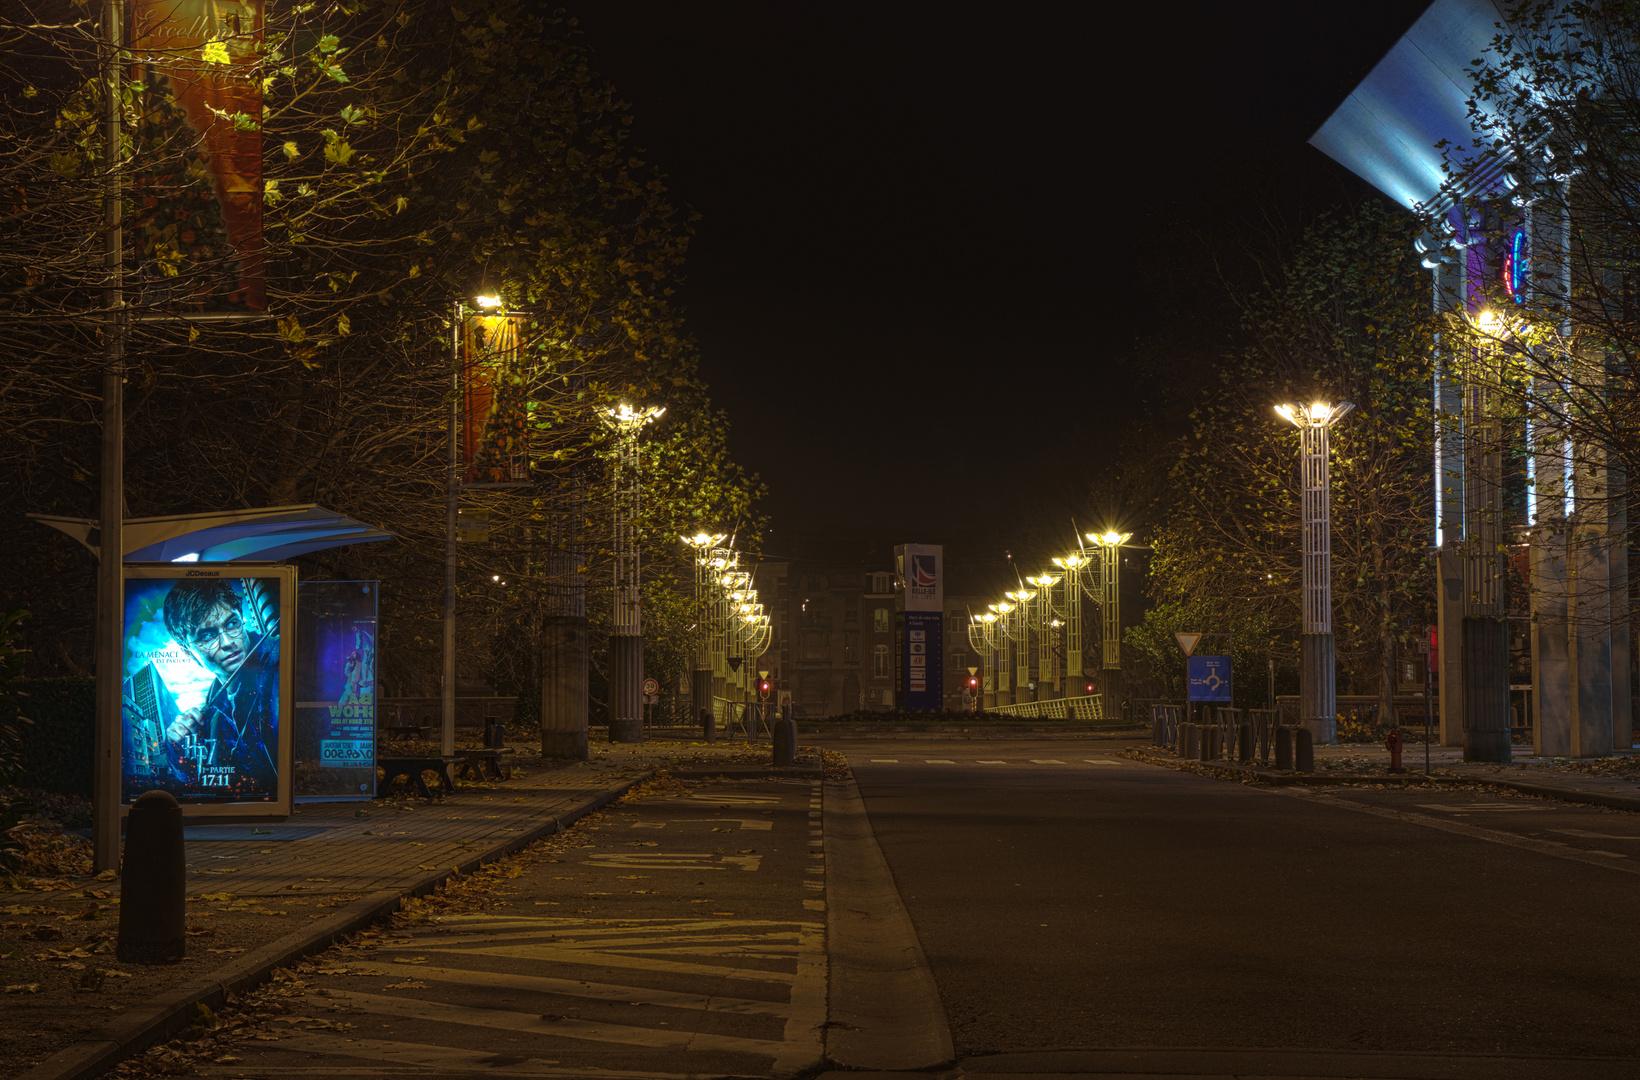 Liège belle ile